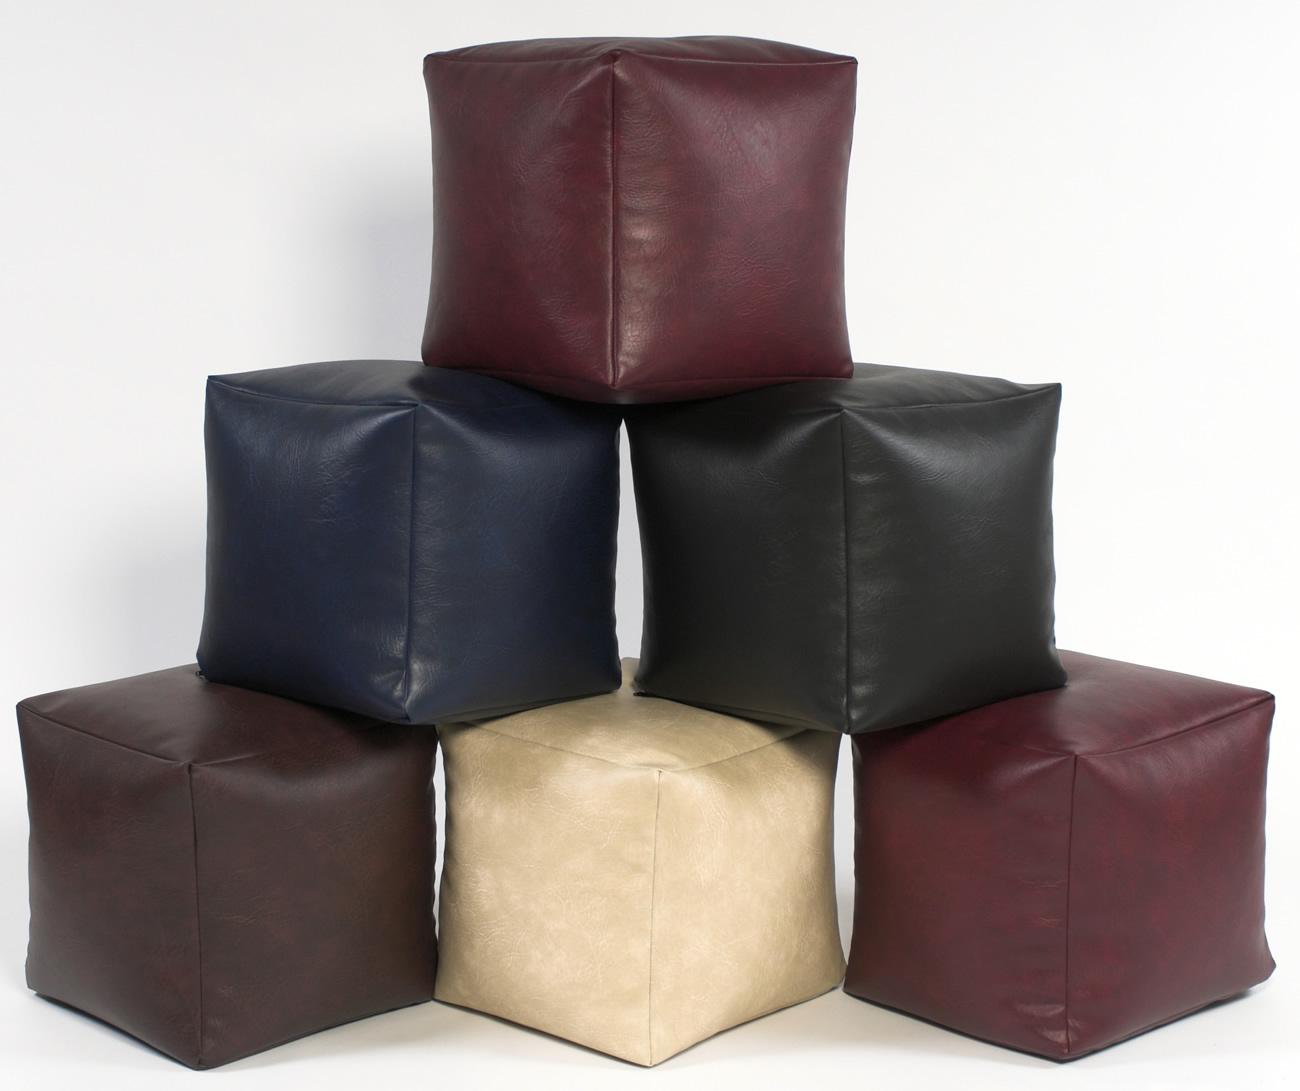 Marvelous Footstool Cube Faux Leather Creativecarmelina Interior Chair Design Creativecarmelinacom